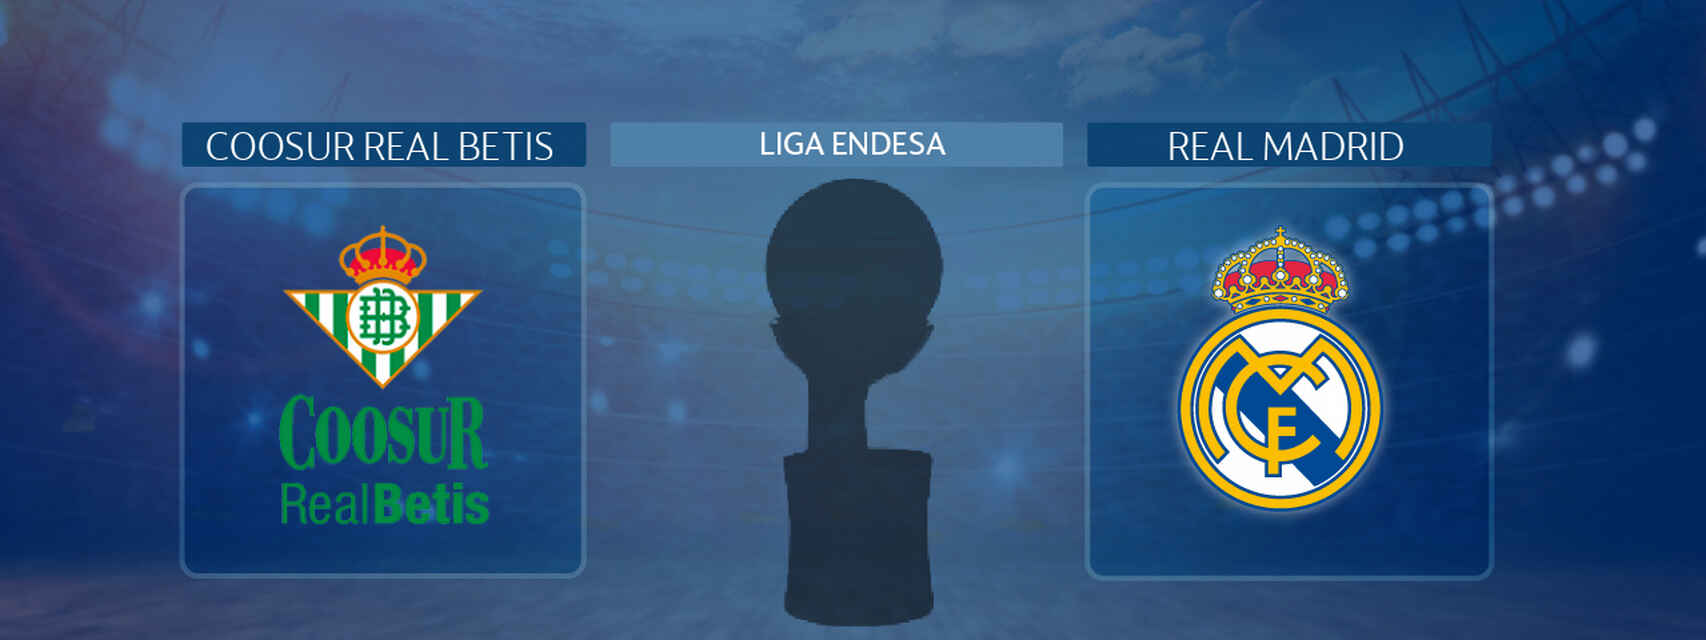 Coosur Real Betis - Real Madrid, partido de la Liga Endesa